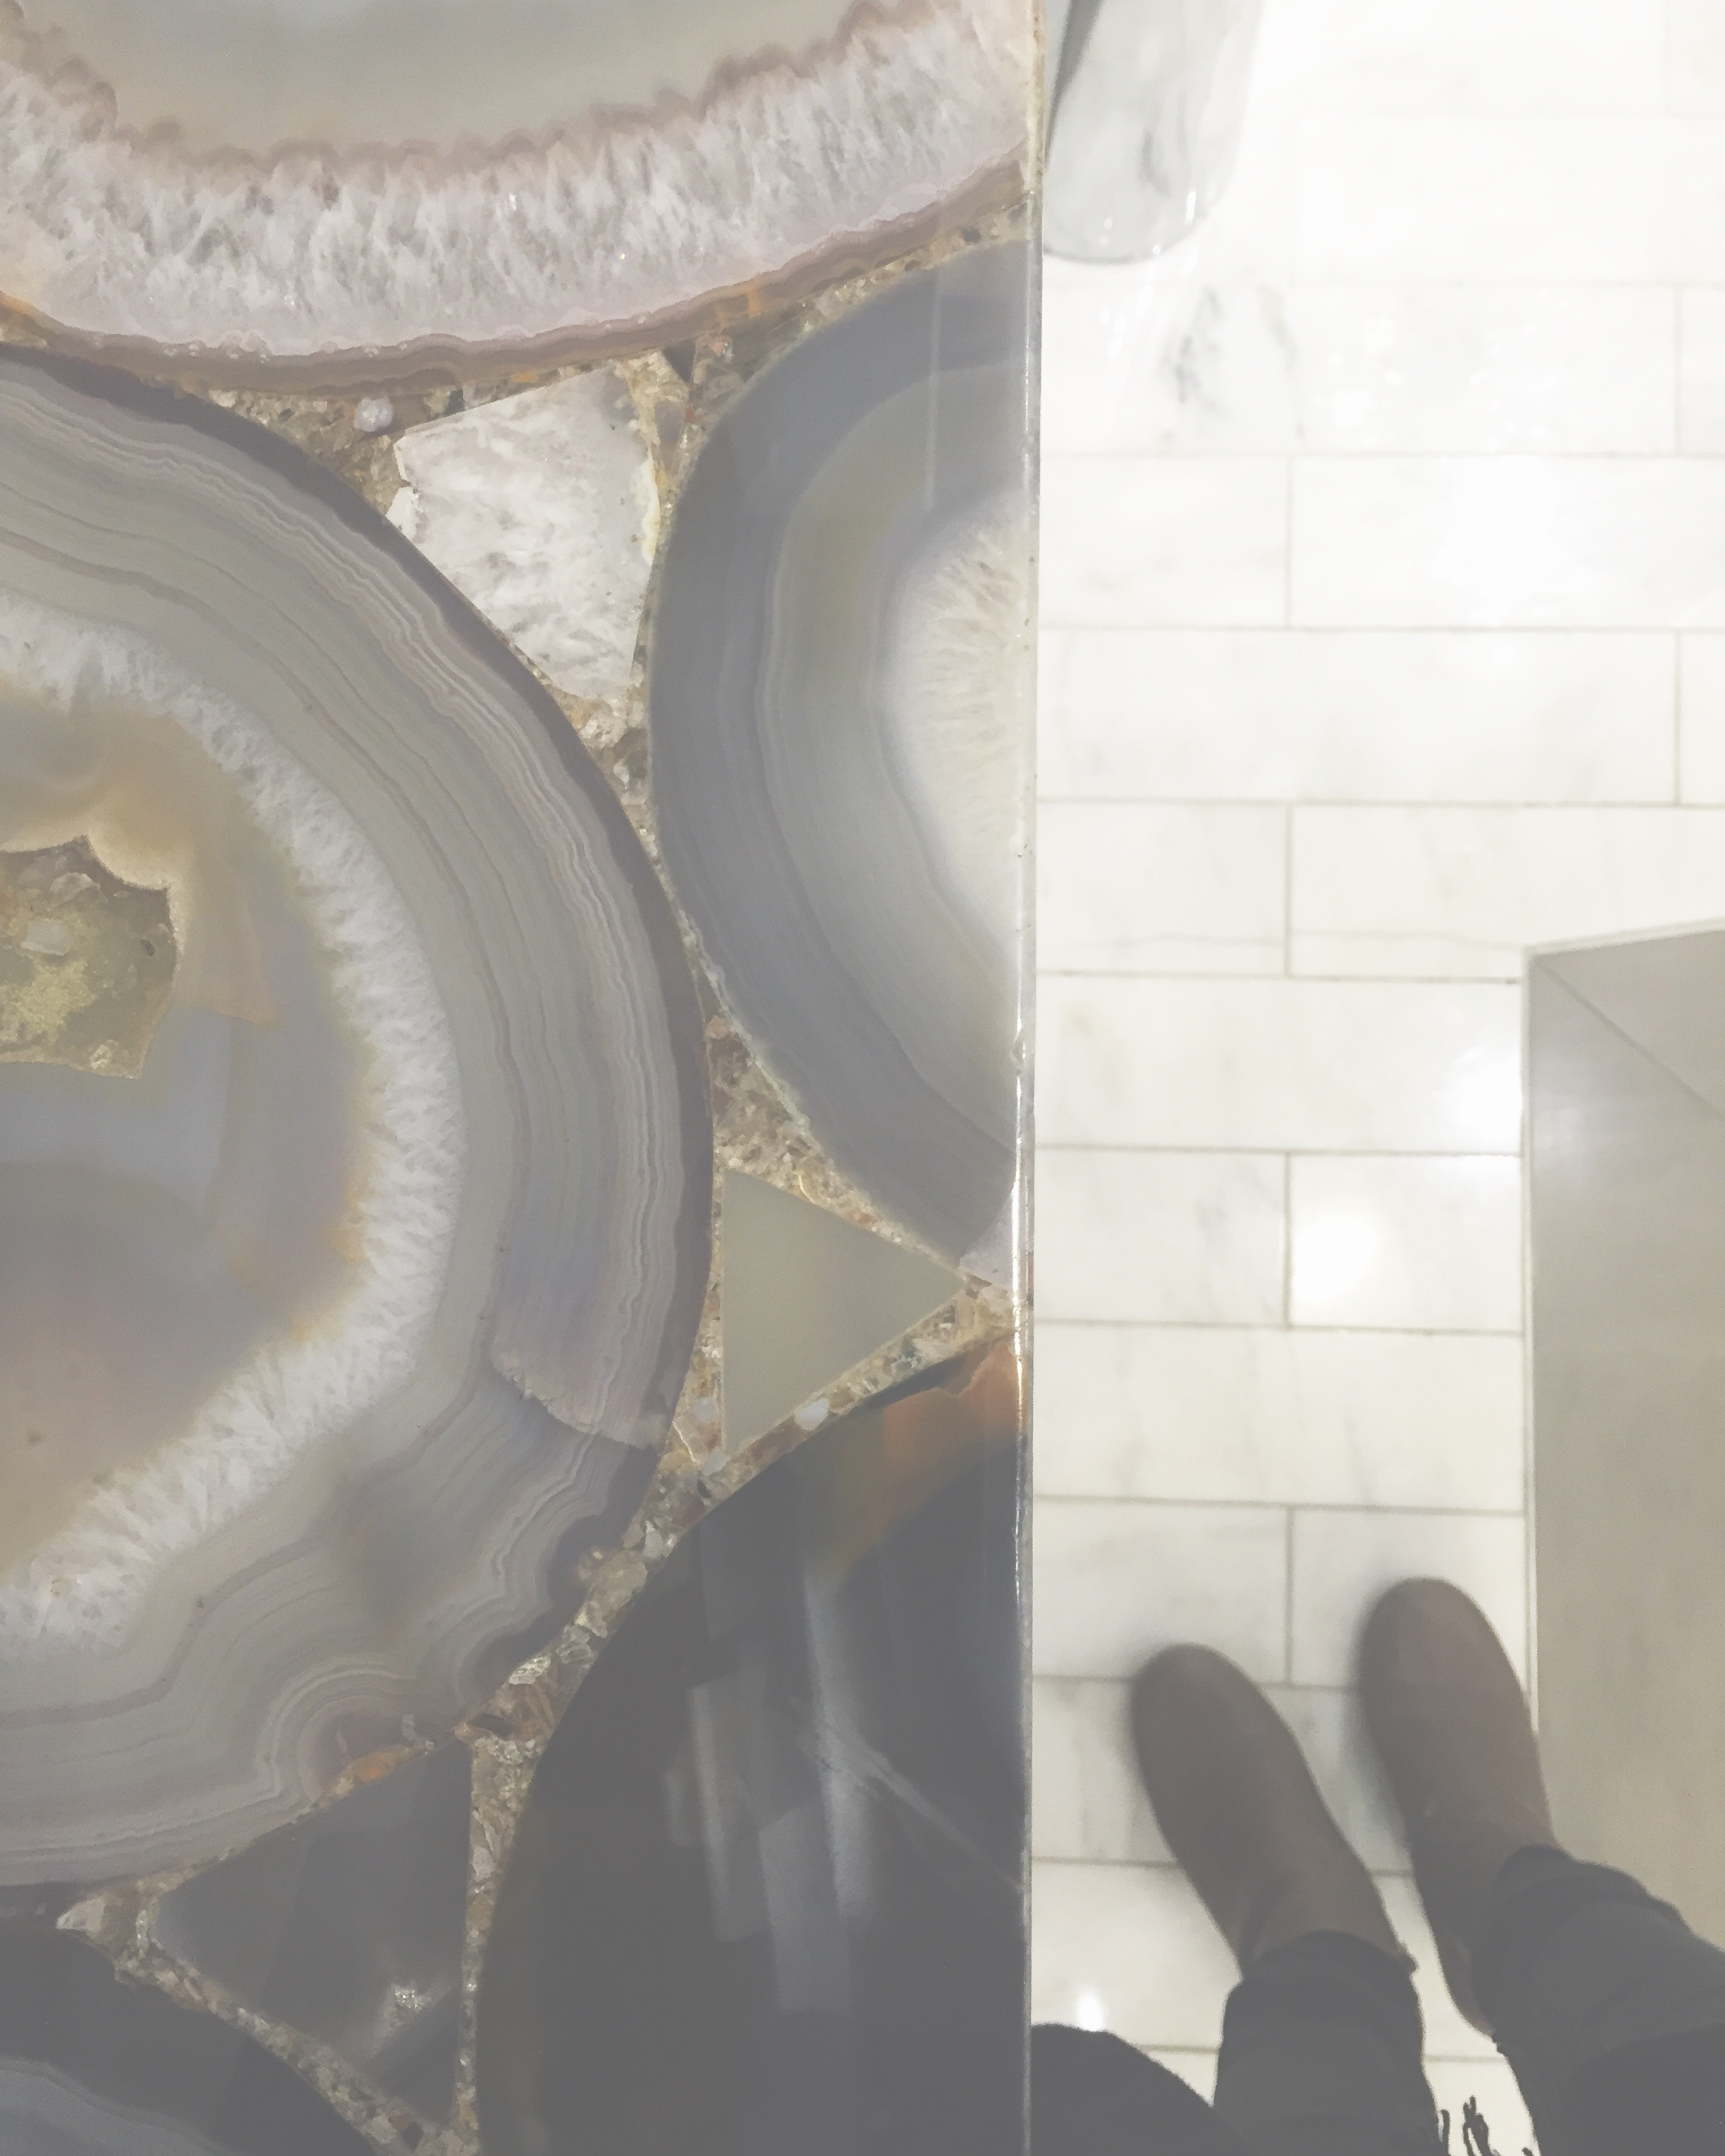 Flashy  #agate  countertop  #naturalstone  #interiors  #lovemywork